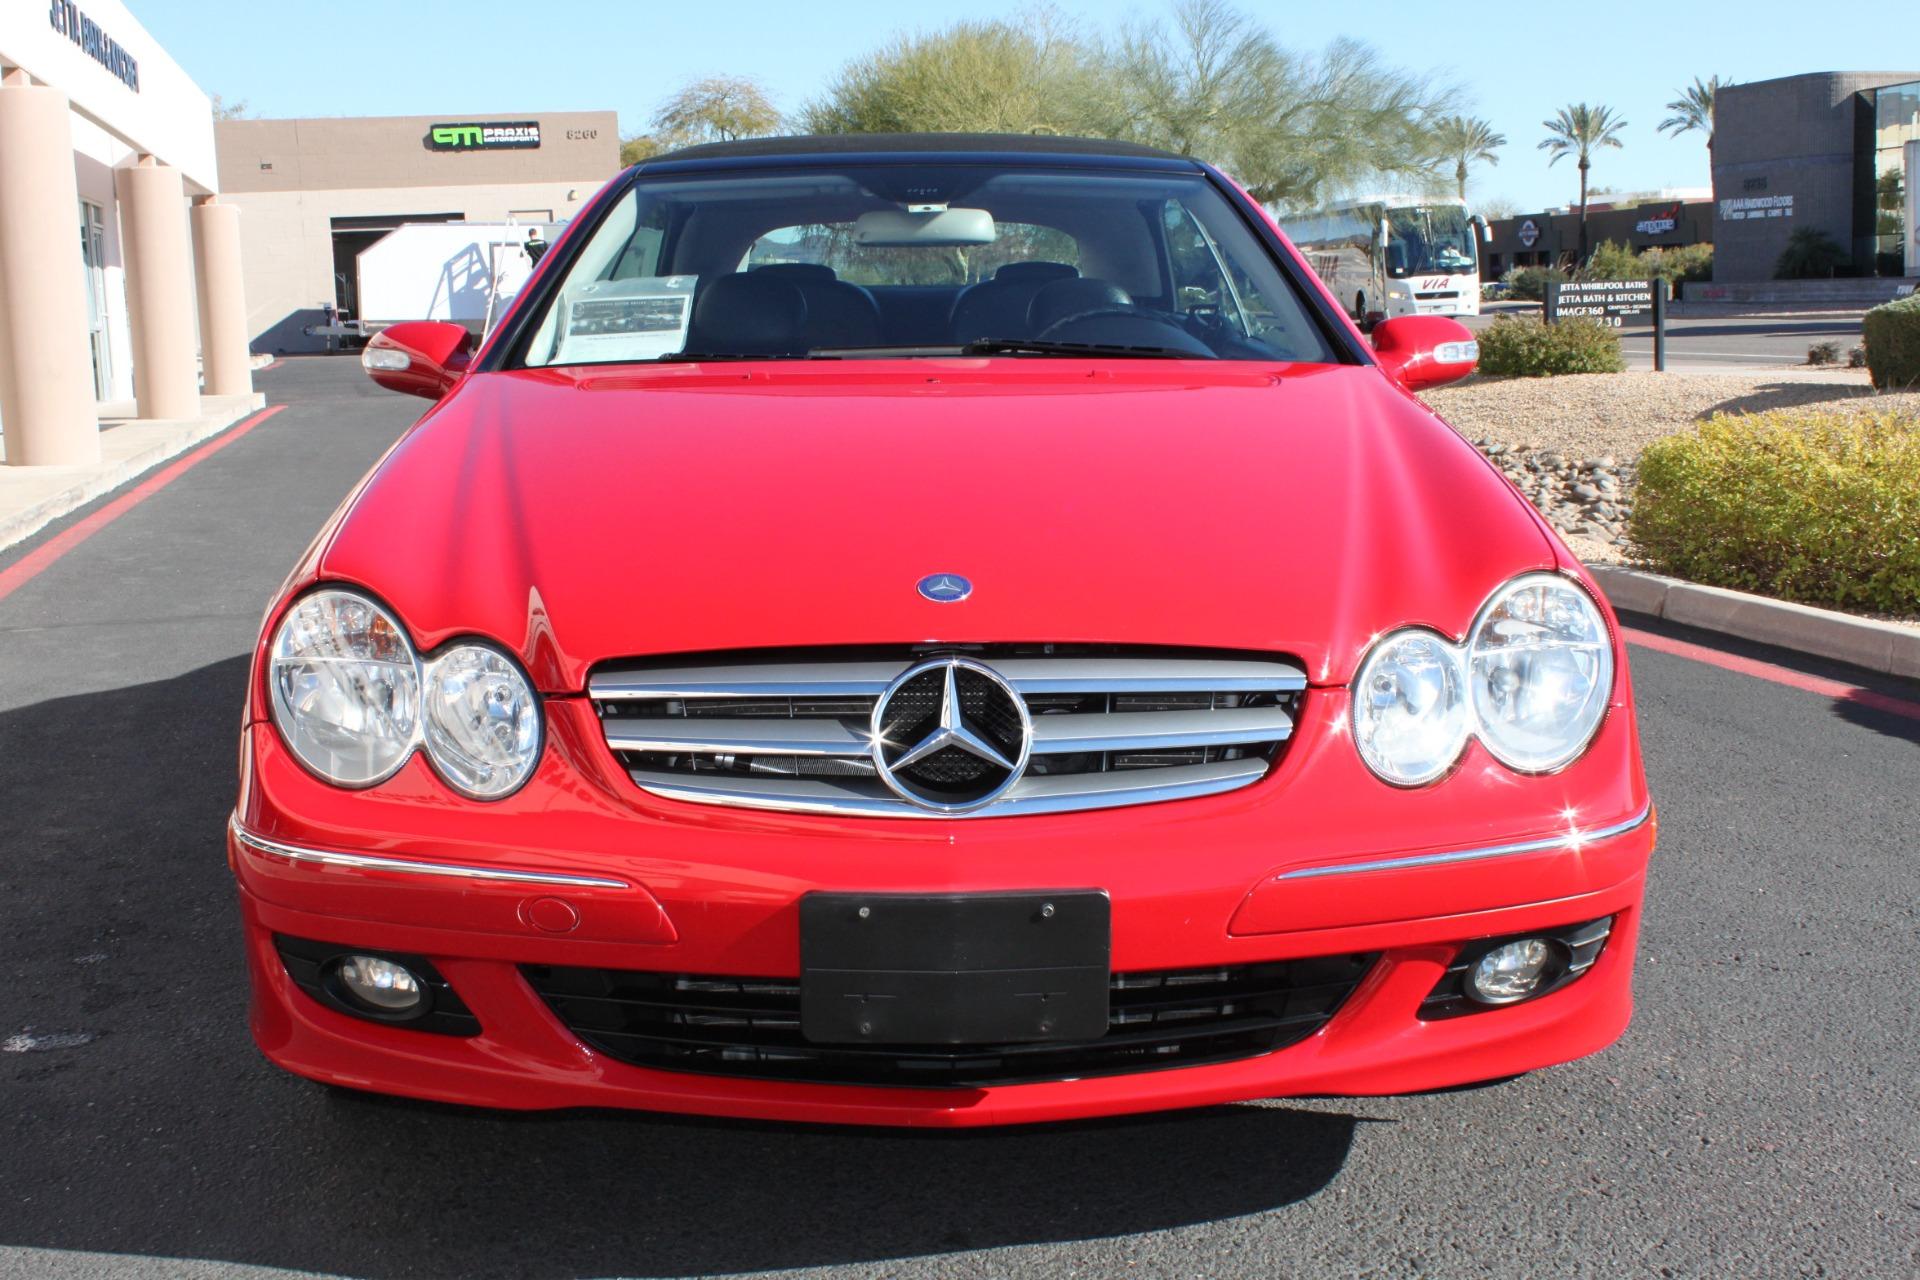 Used-2006-Mercedes-Benz-CLK-Class-CLK350-Cabriolet-35L-Toyota